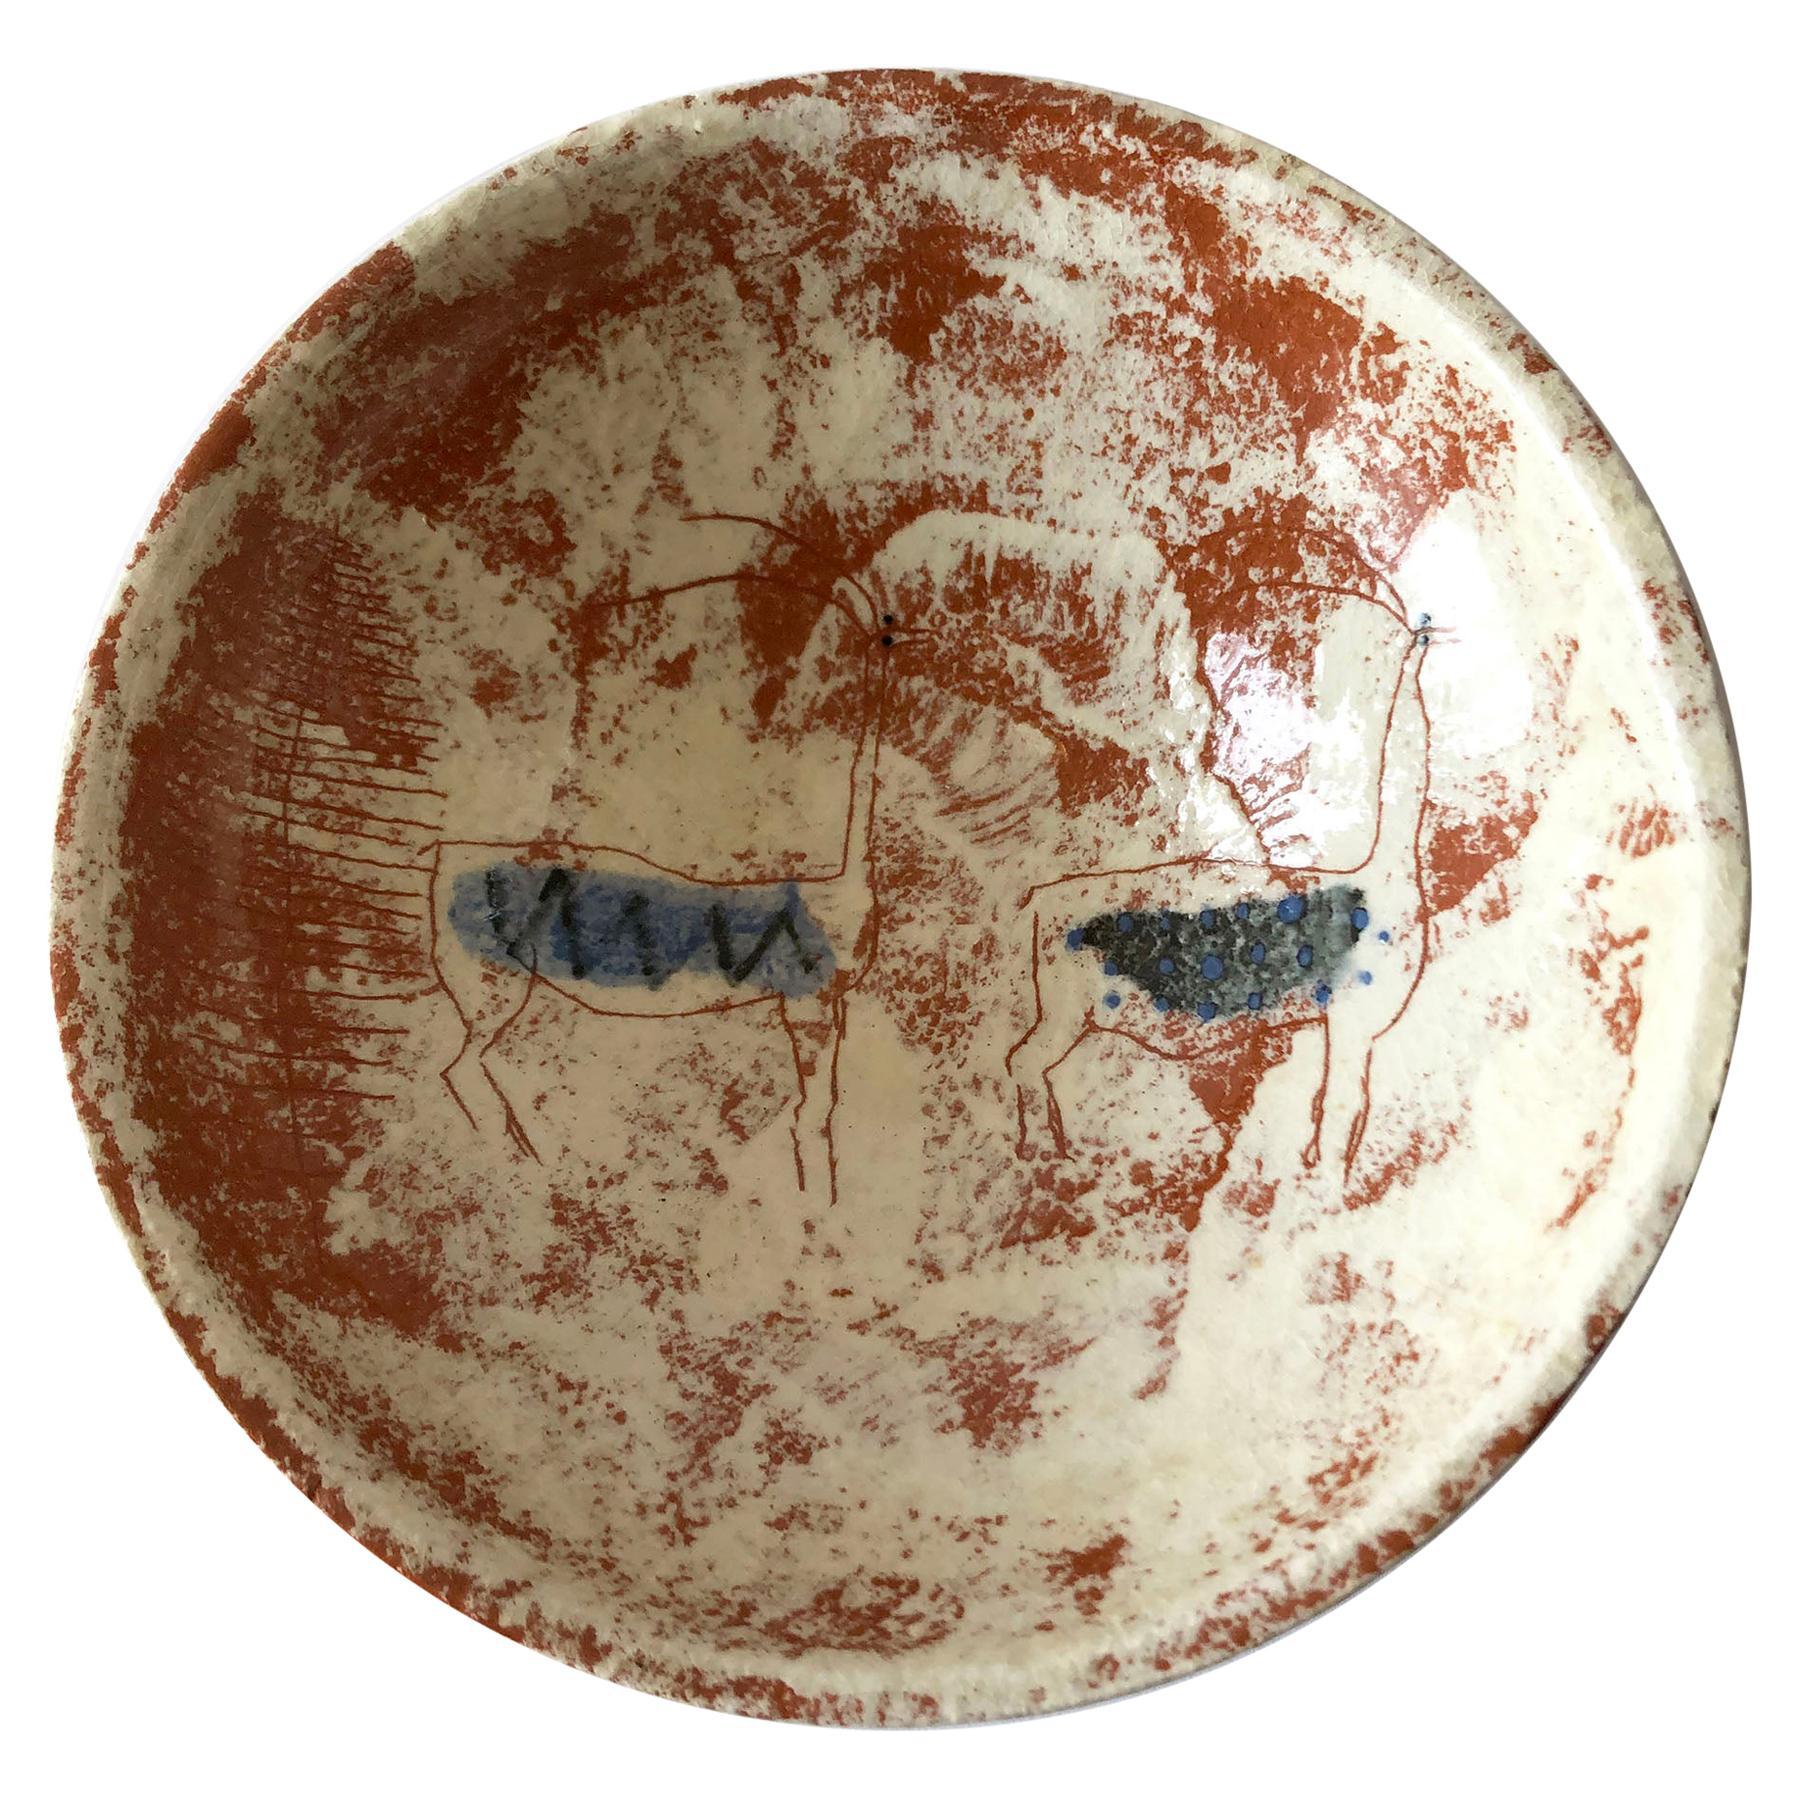 La Gardo Tackett California Studio Ceramic Bowl with Paleolithic Design